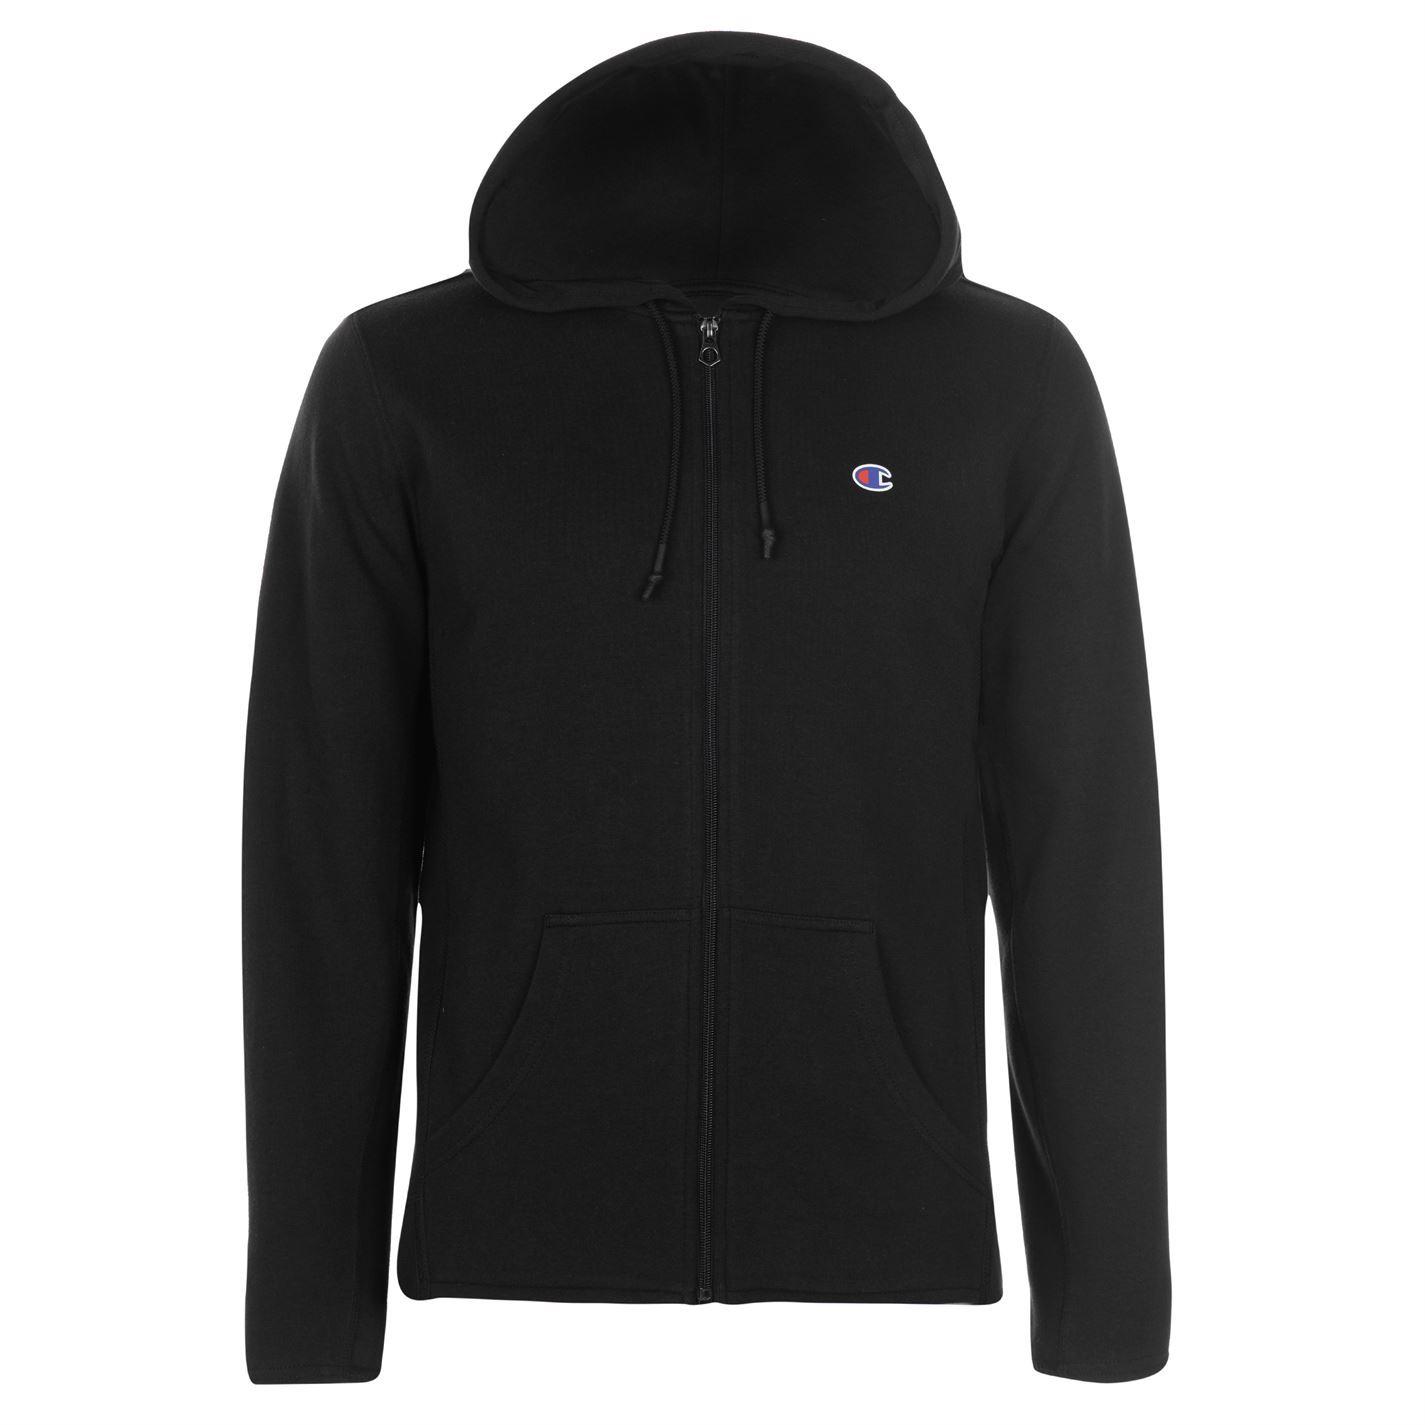 Champion-Interlock-Full-Zip-Hoody-Mens-Hoodie-Top-Sweatshirt-Sweater thumbnail 4